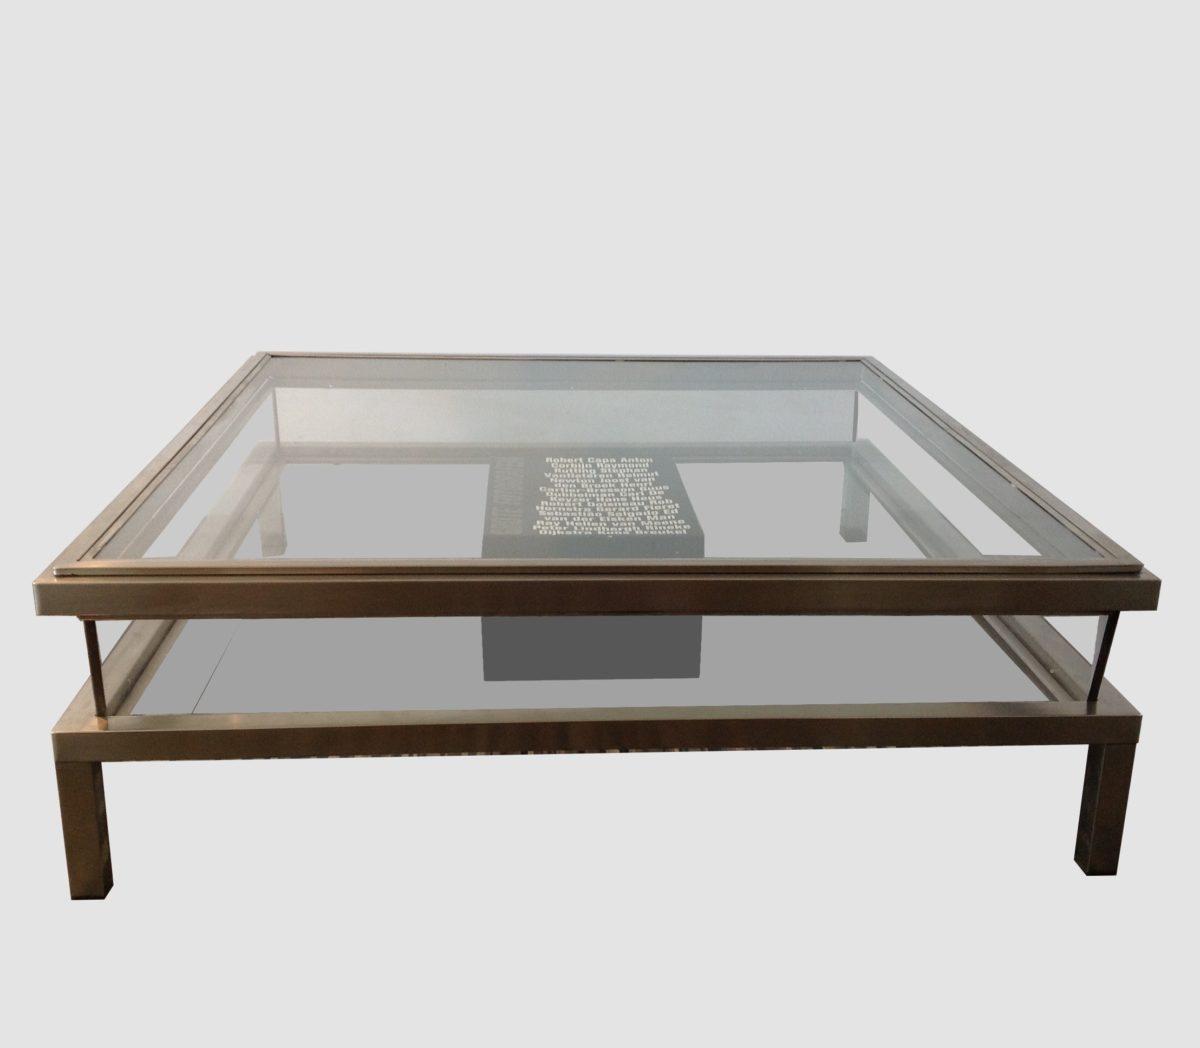 Grote Side Table.Table S Yvar Kilian Amsterdam